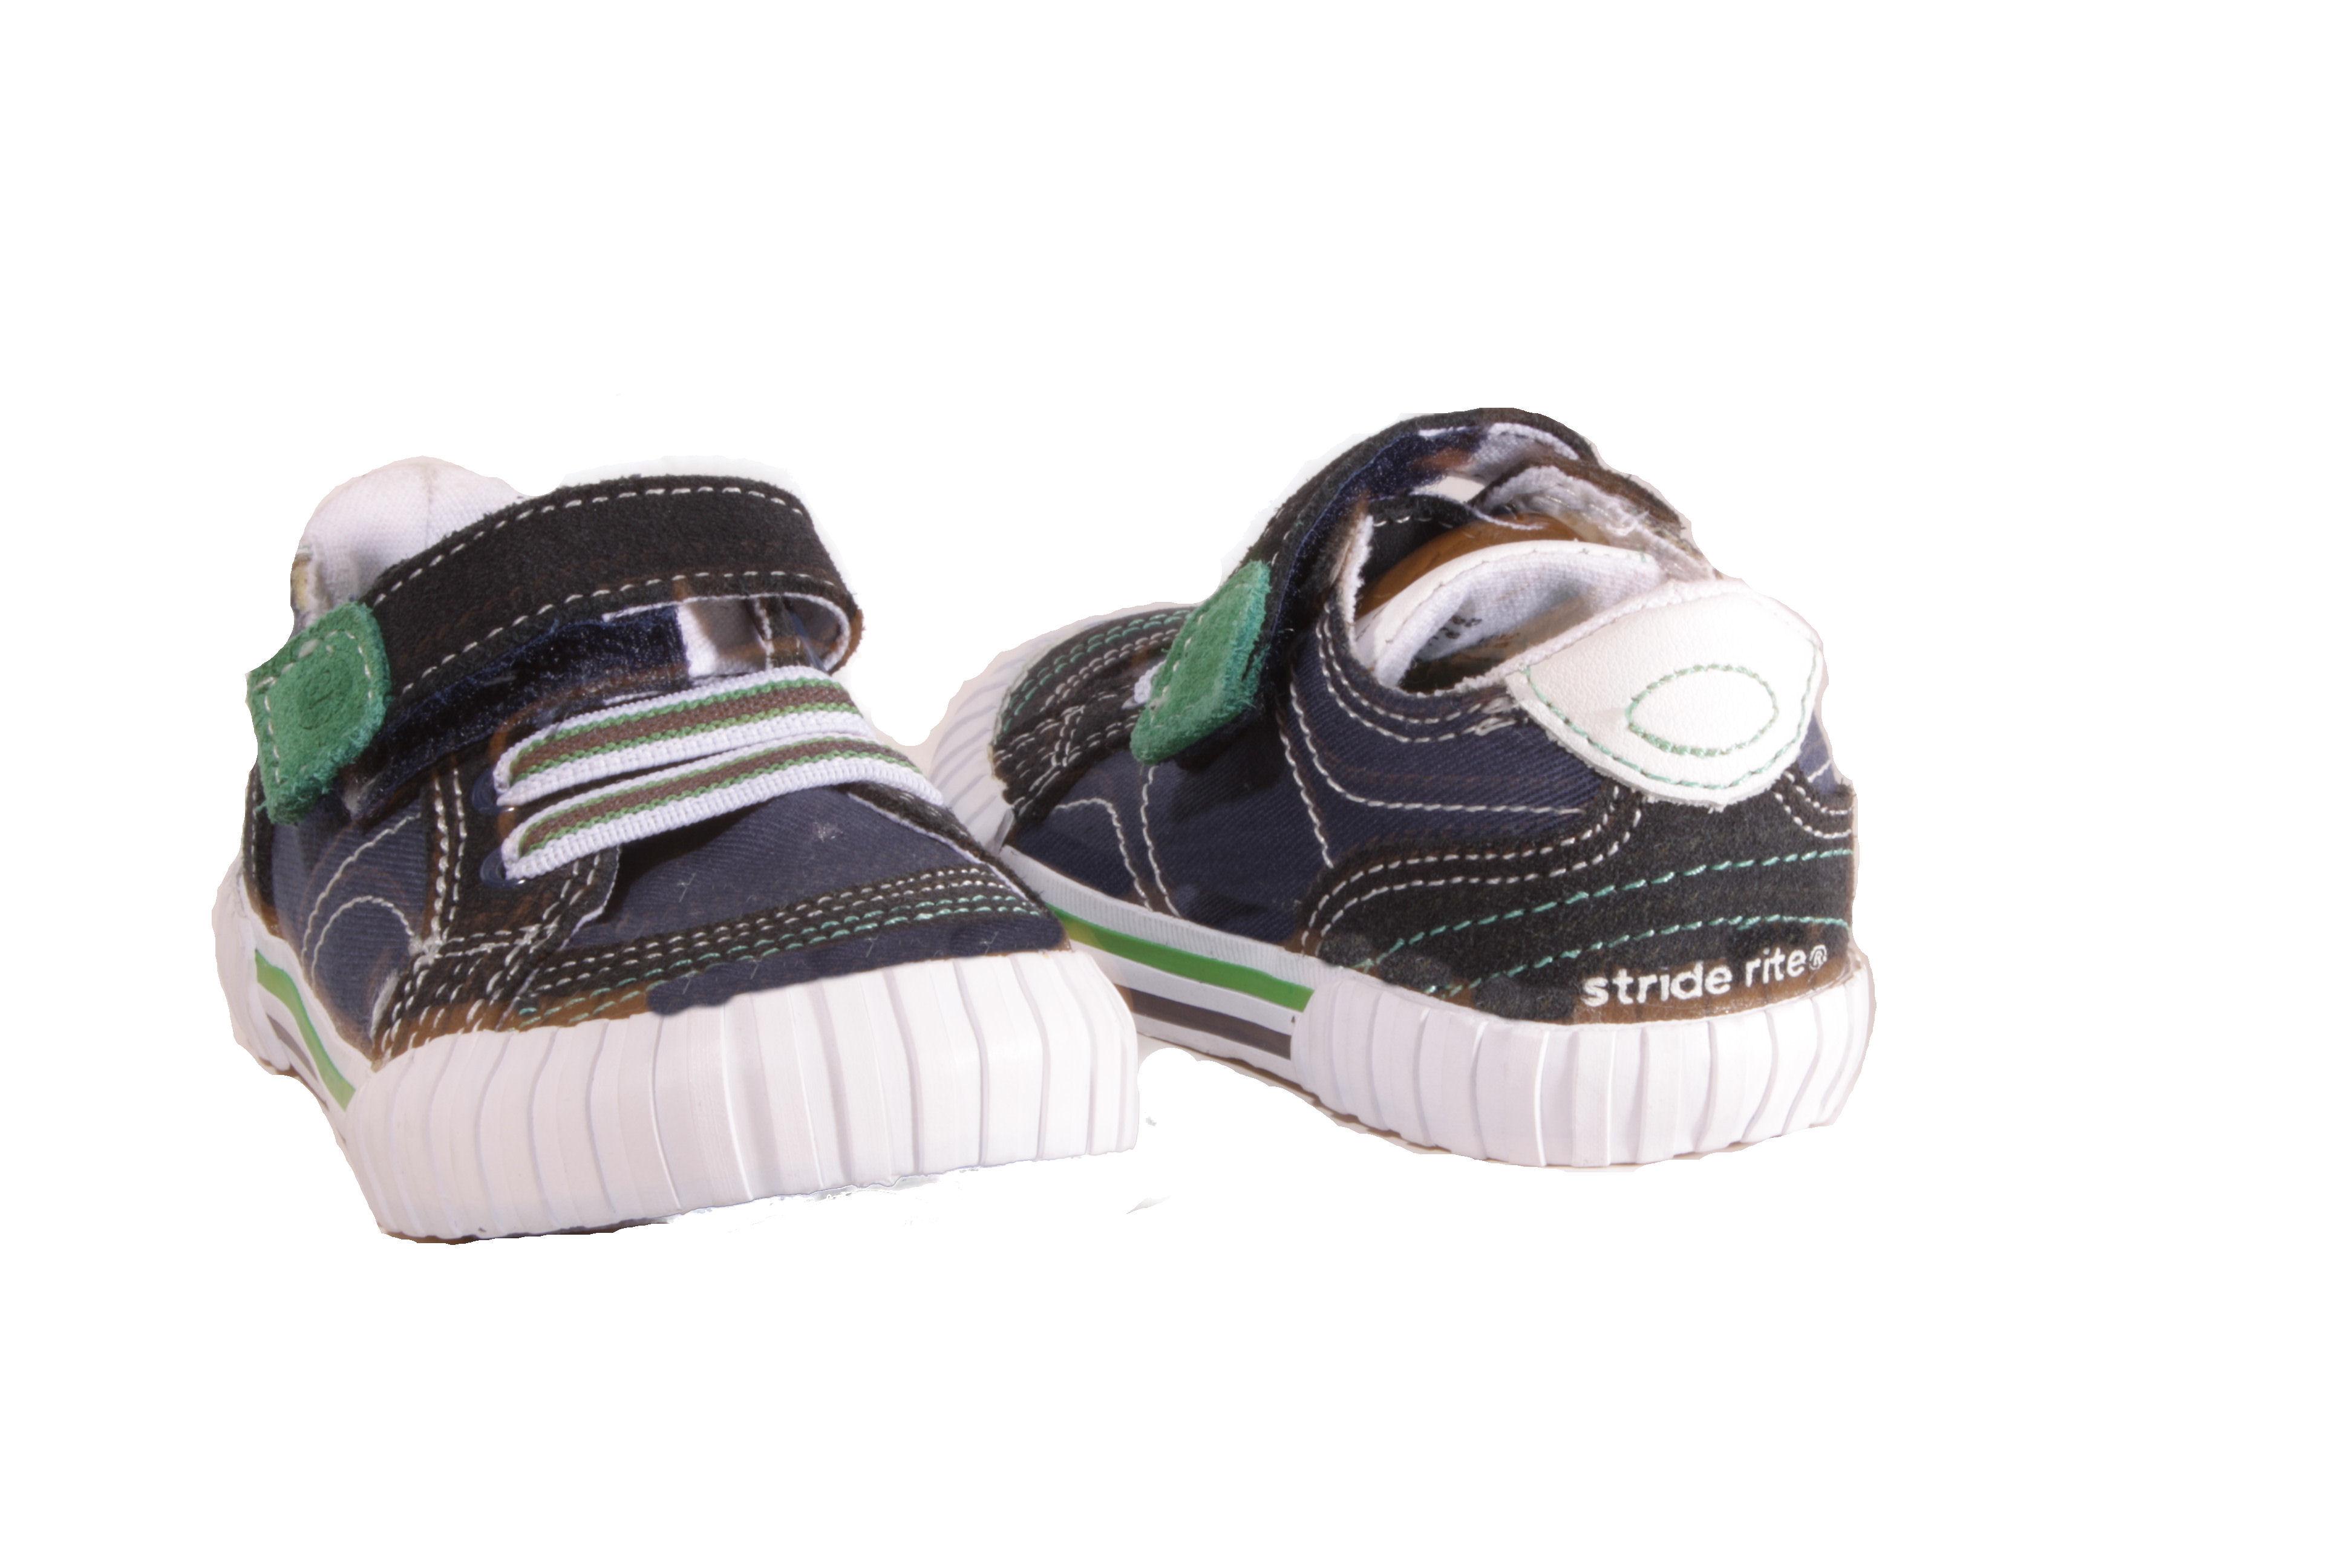 Stride-Rite-Green-or-Blue-Caleb-Casual-Sneakers-Boy-Infants-Toddlers-Sneakers